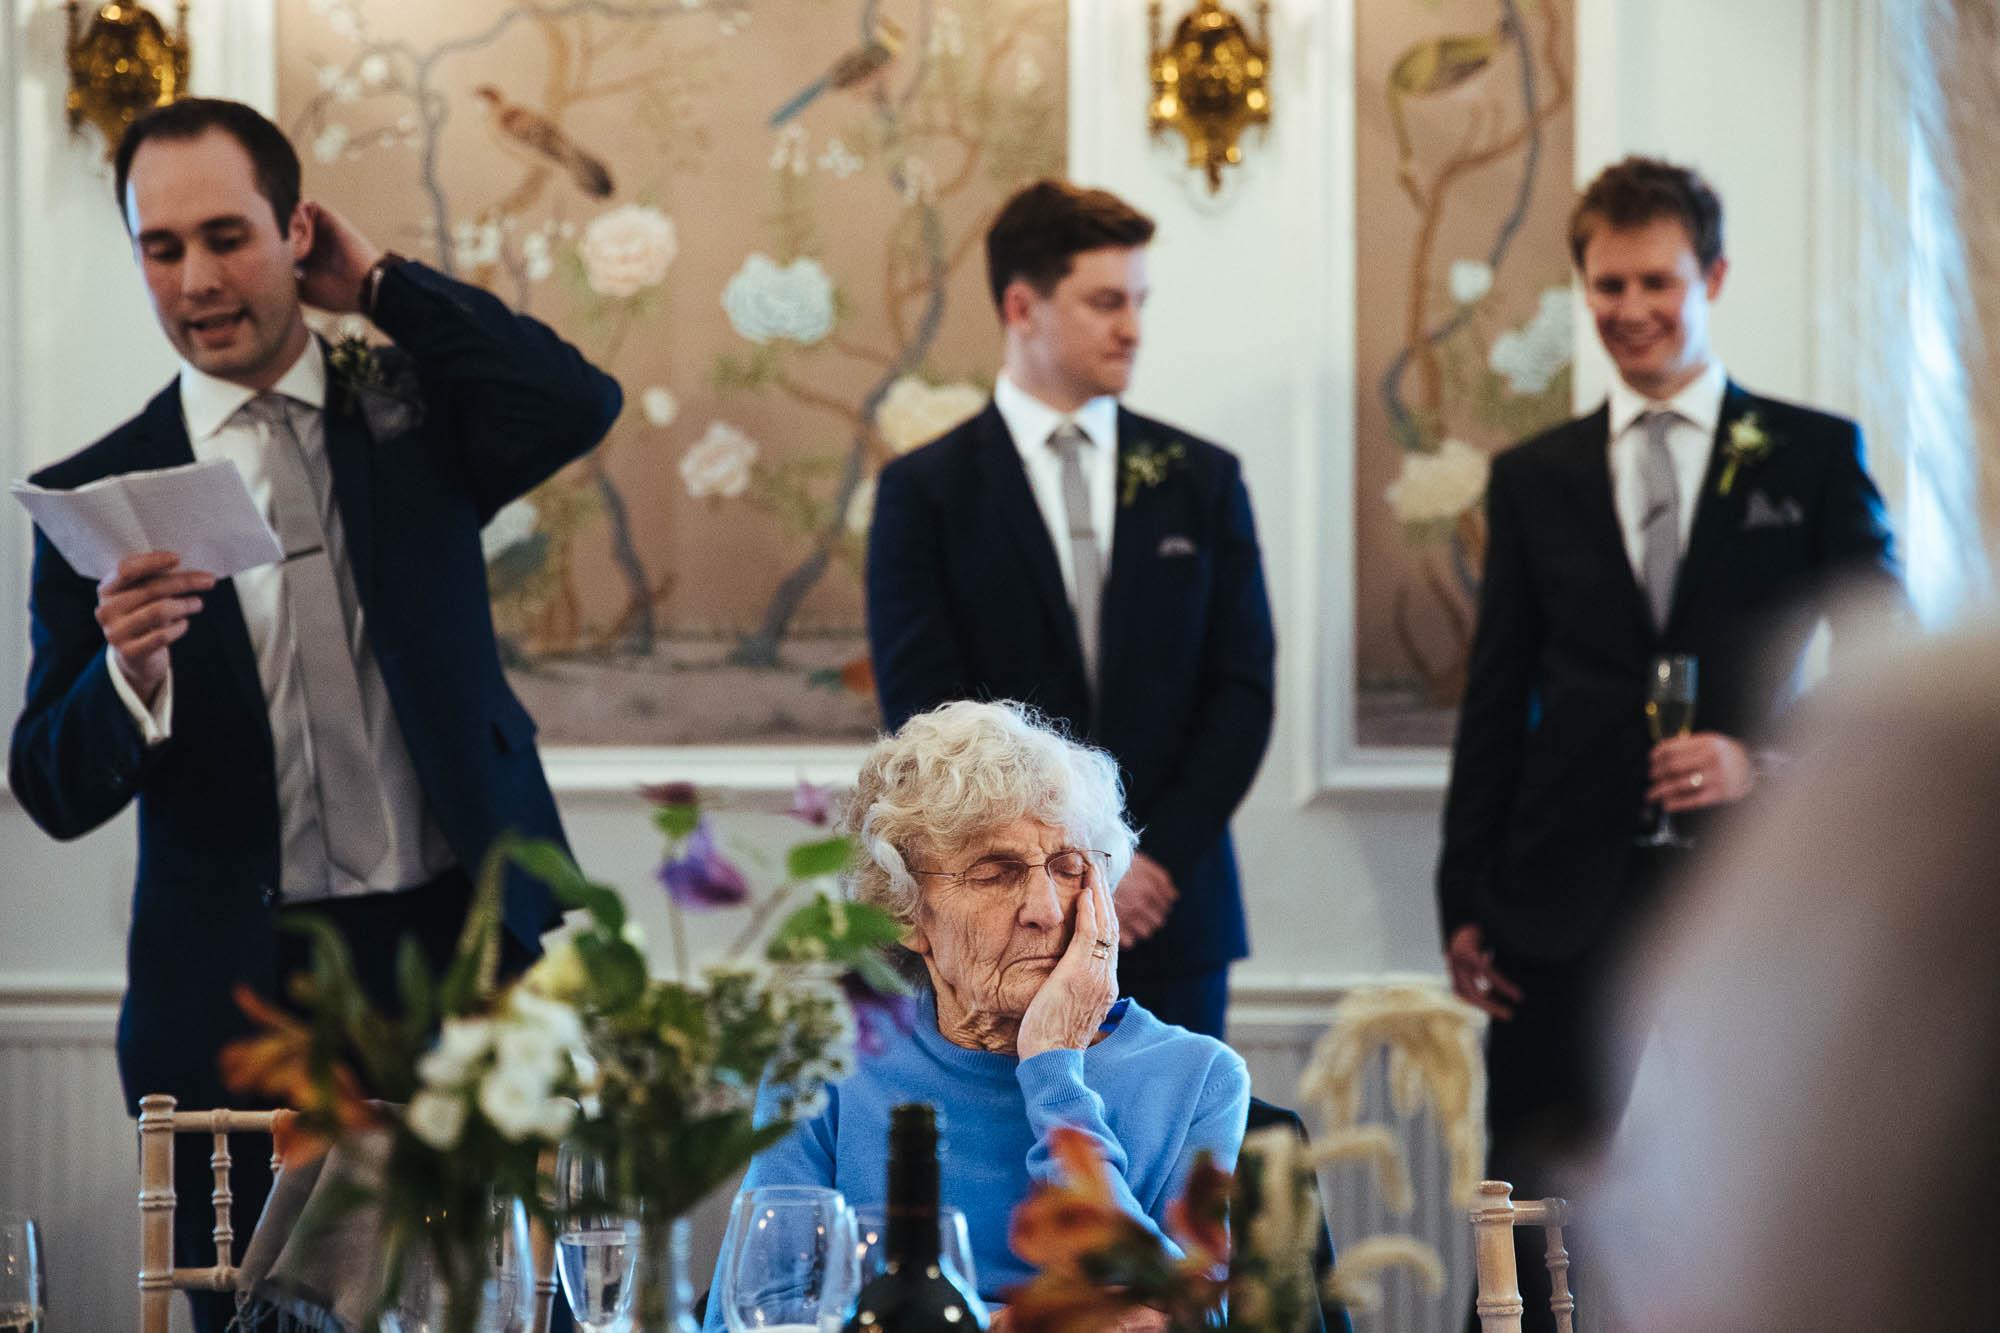 slepping granmda wedding speeches